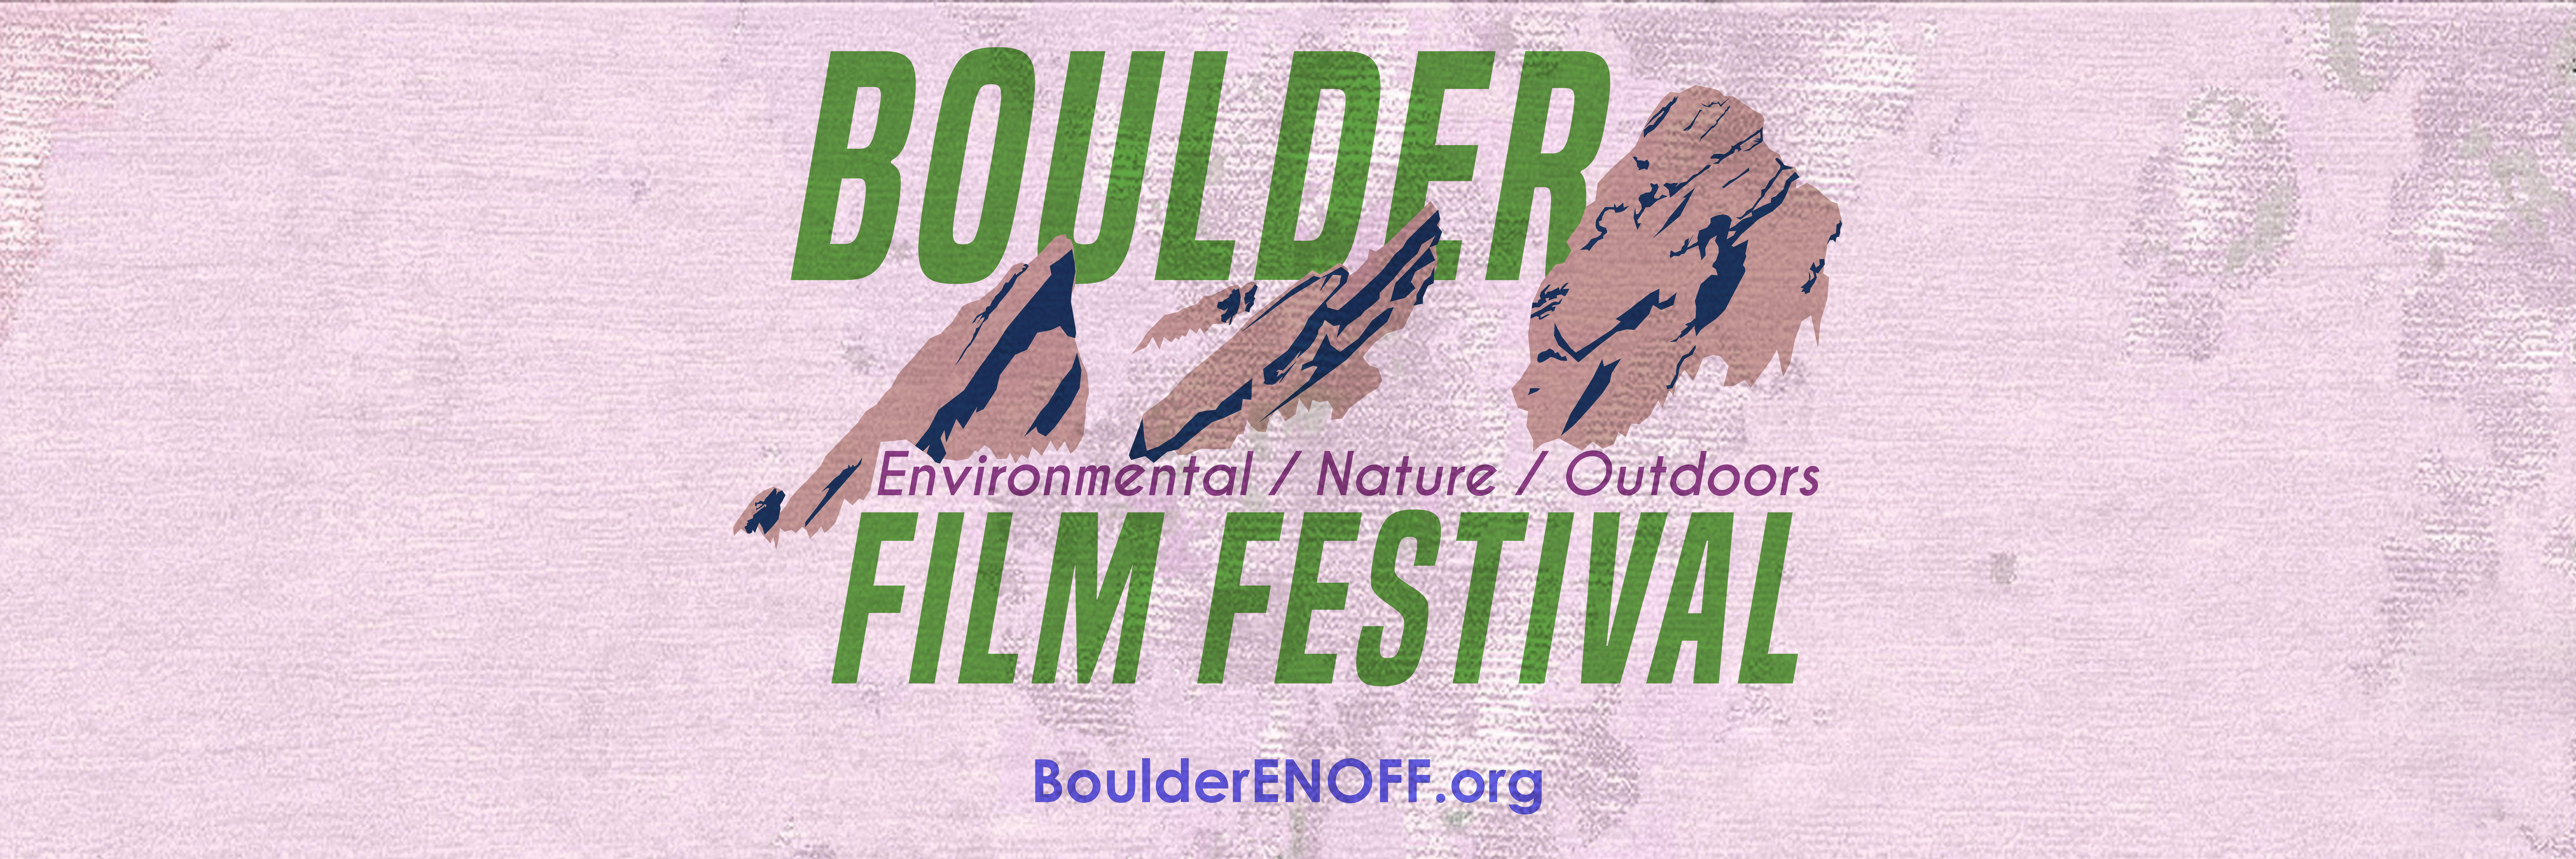 Boulder Environmental/Nature/Outdoor Film Festival 2021